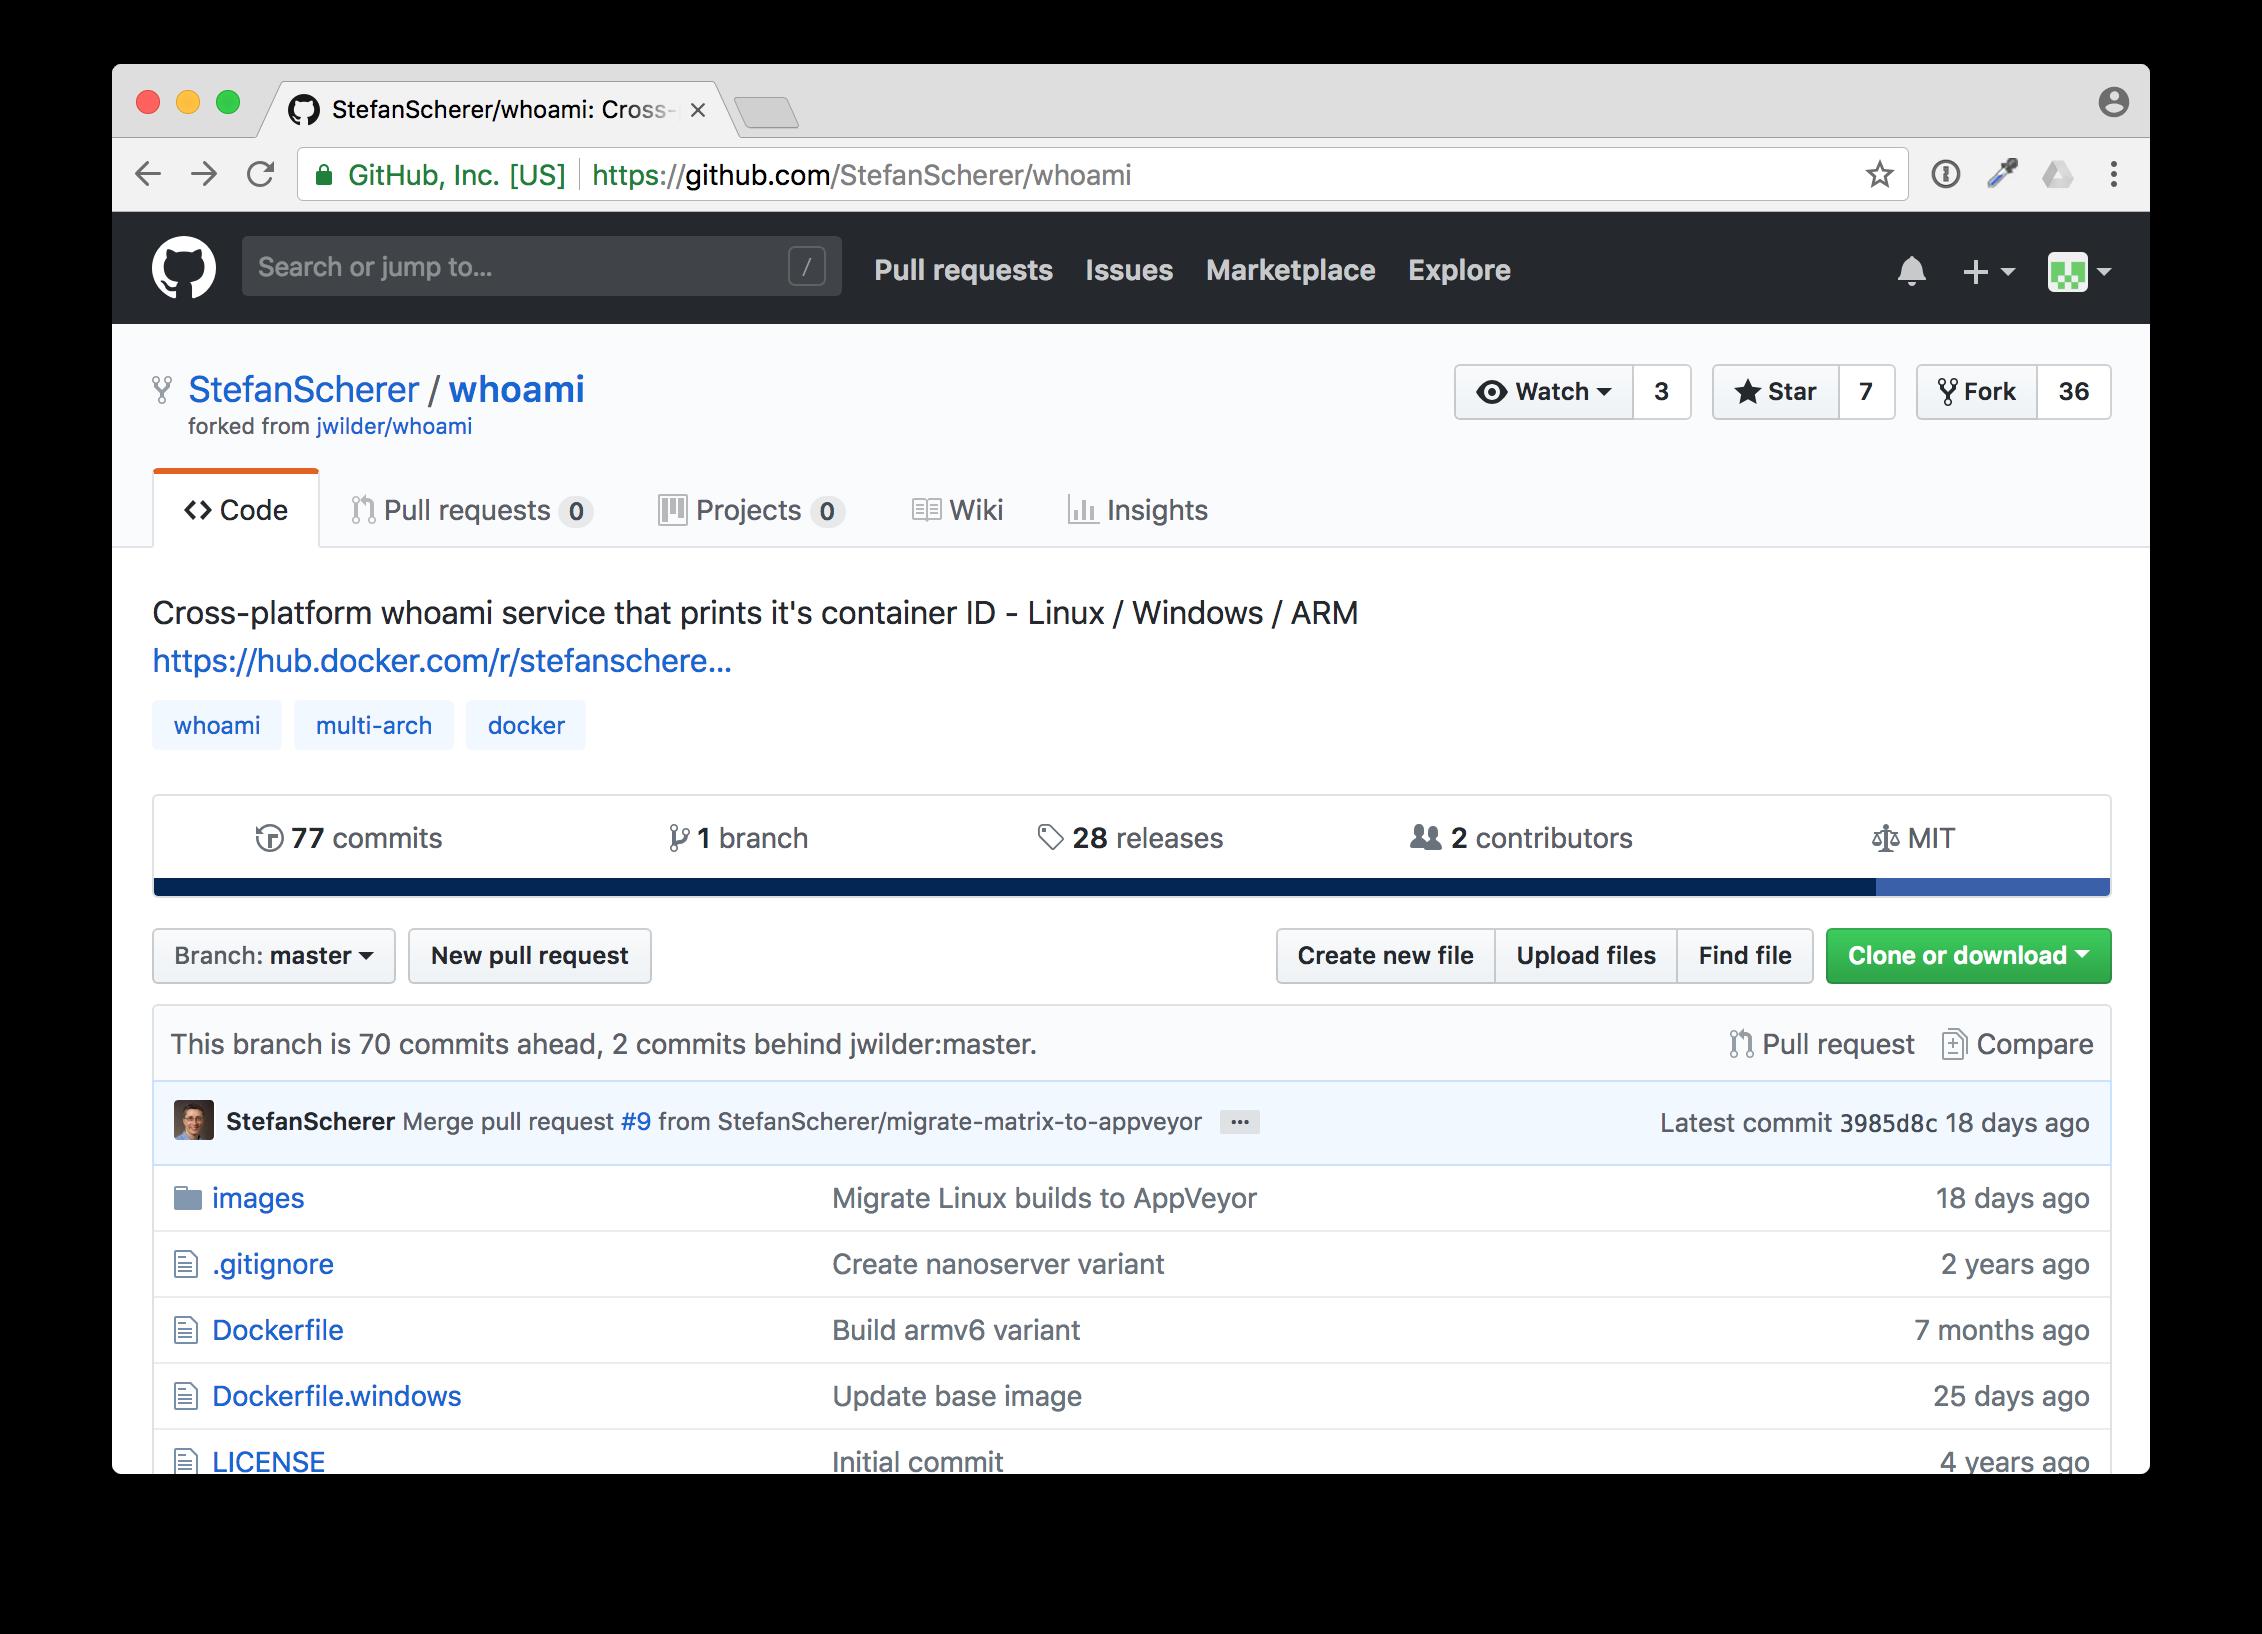 GitHub StefanScherer/whoami repo